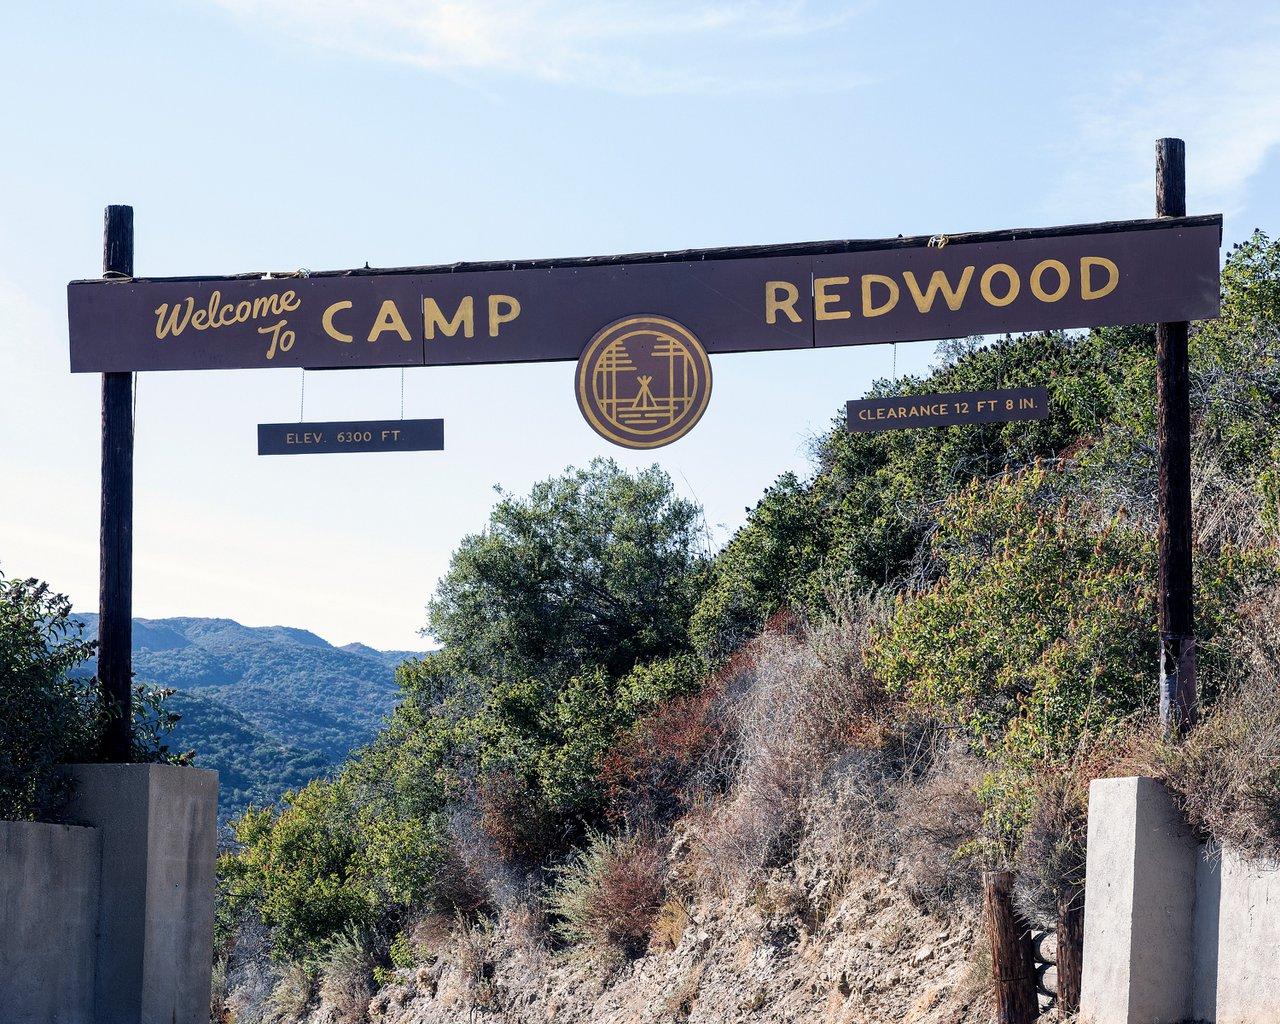 AHS:1984 The Camp Redwood Experience photo 5E8A8303.jpg